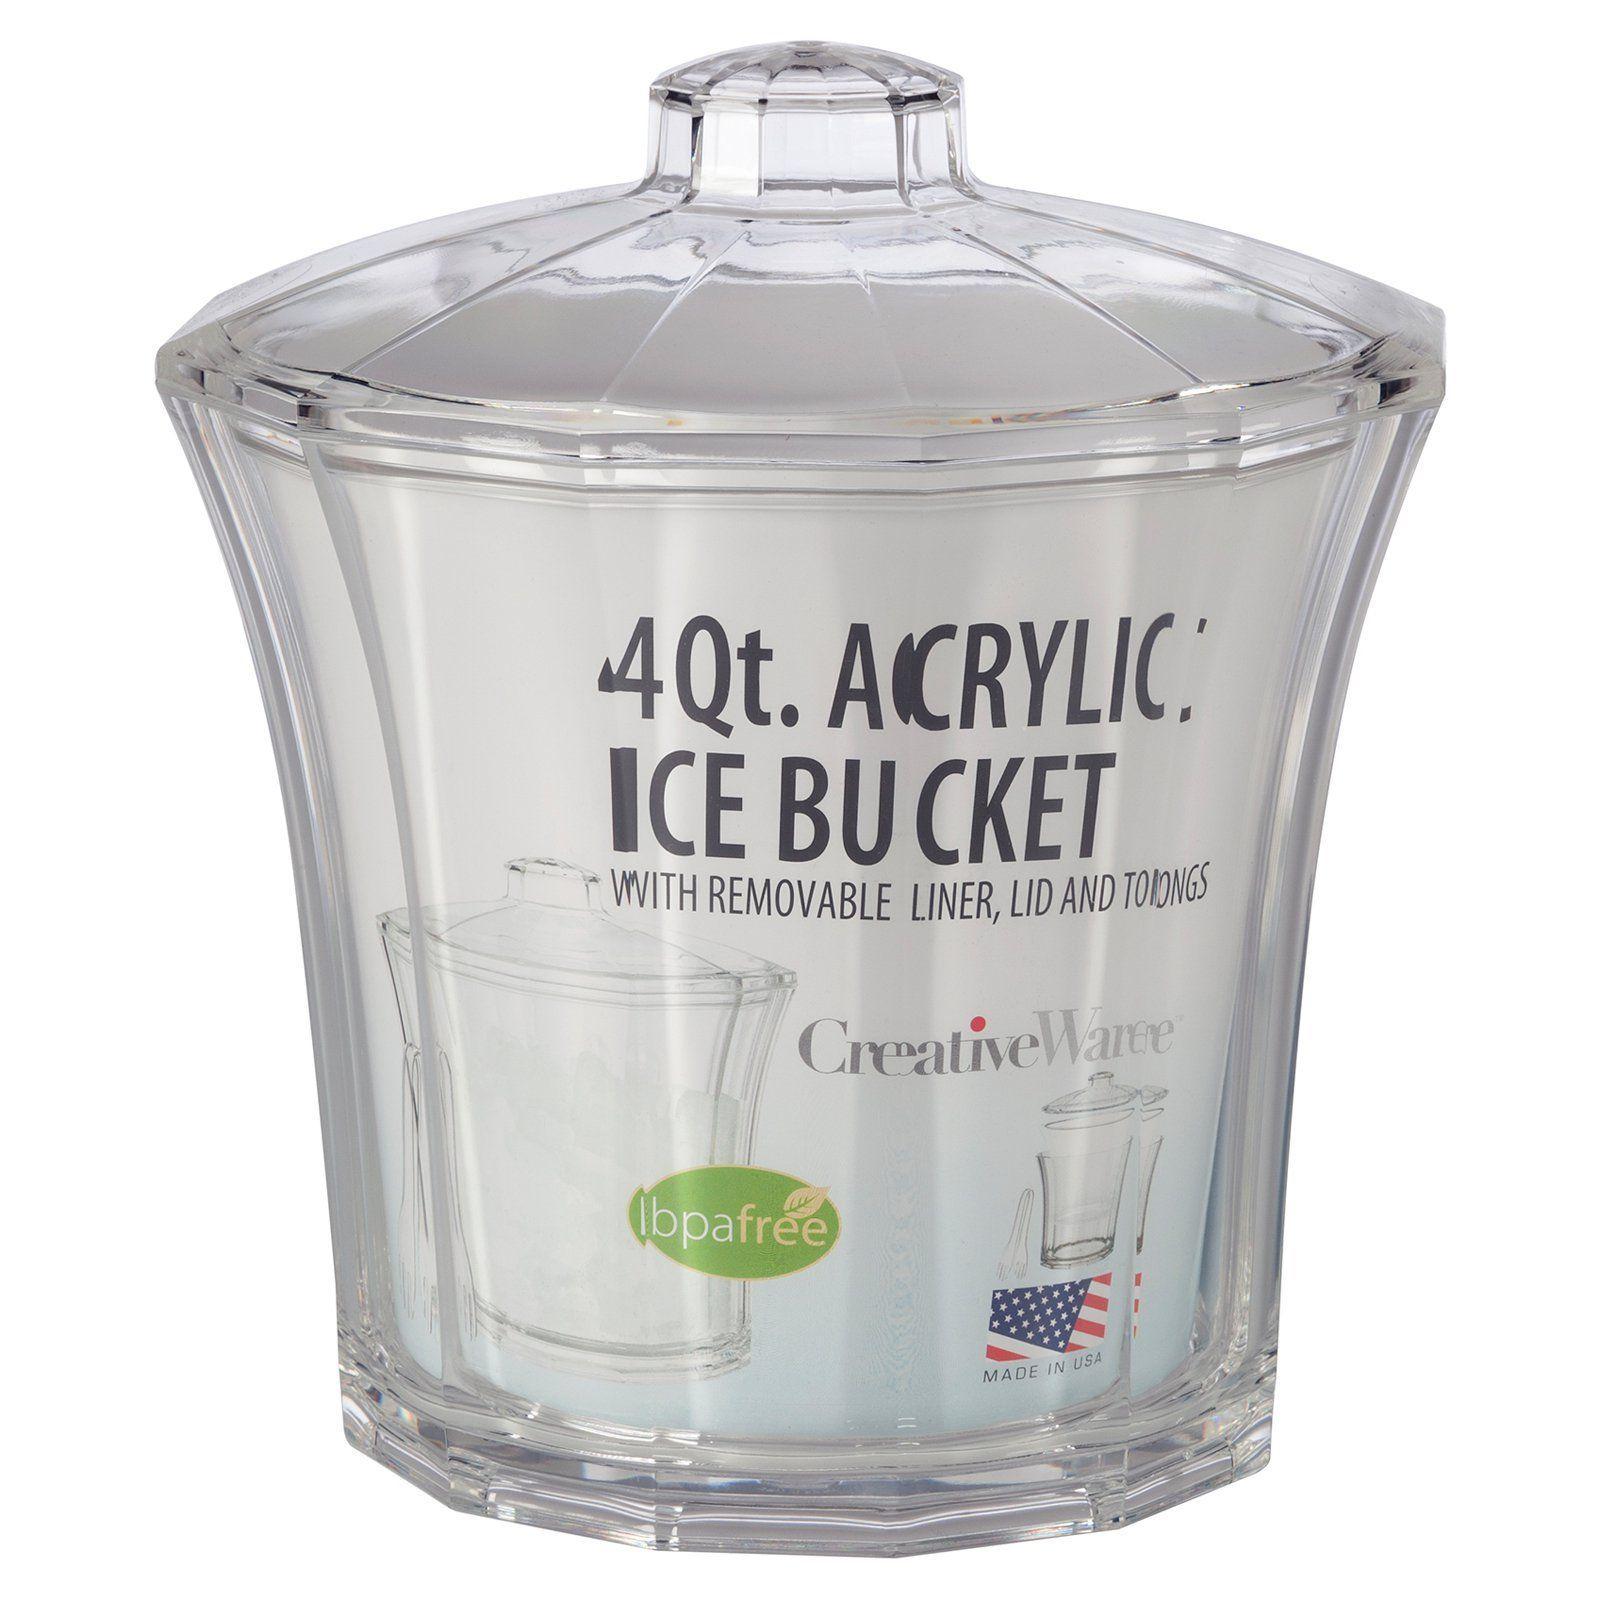 Creative ware insulated acrylic ice bucket and tongs ice